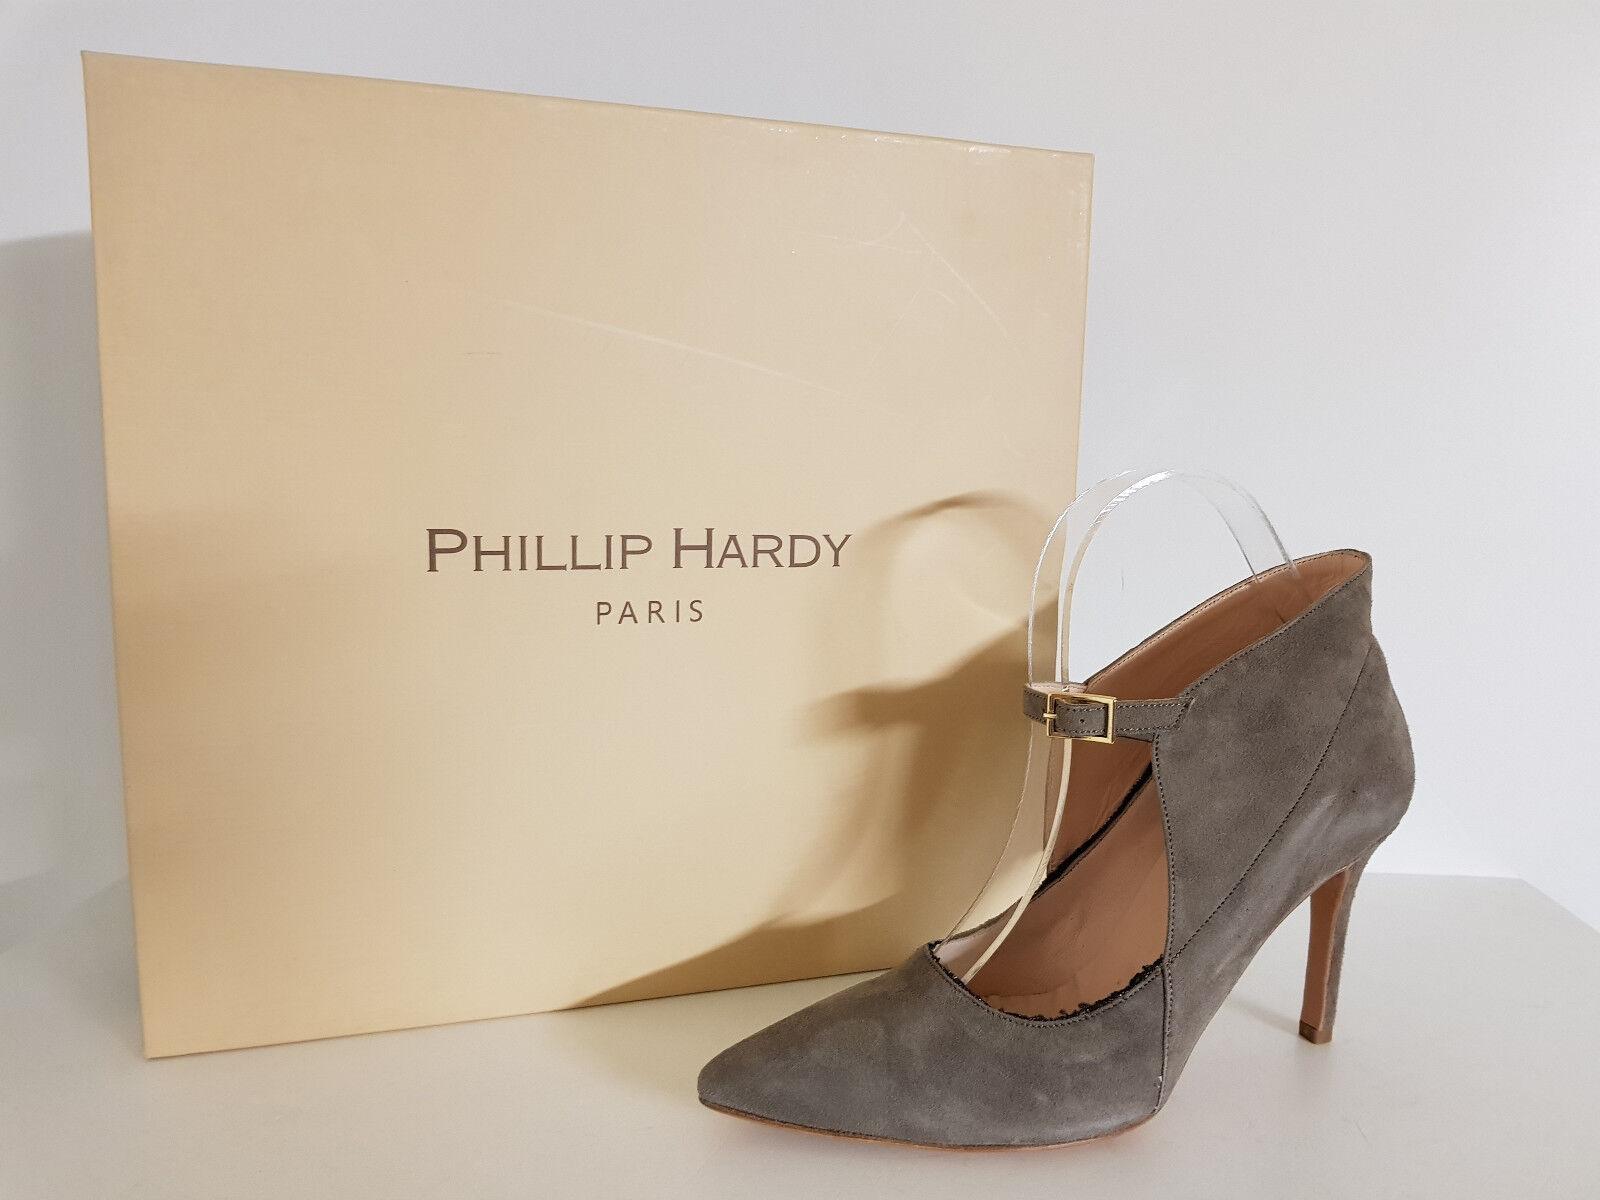 Scarpa Damenschuhe  Phillip Hardy  Decolte'.Sconto -75 % Art. 106-442  Col.Beige